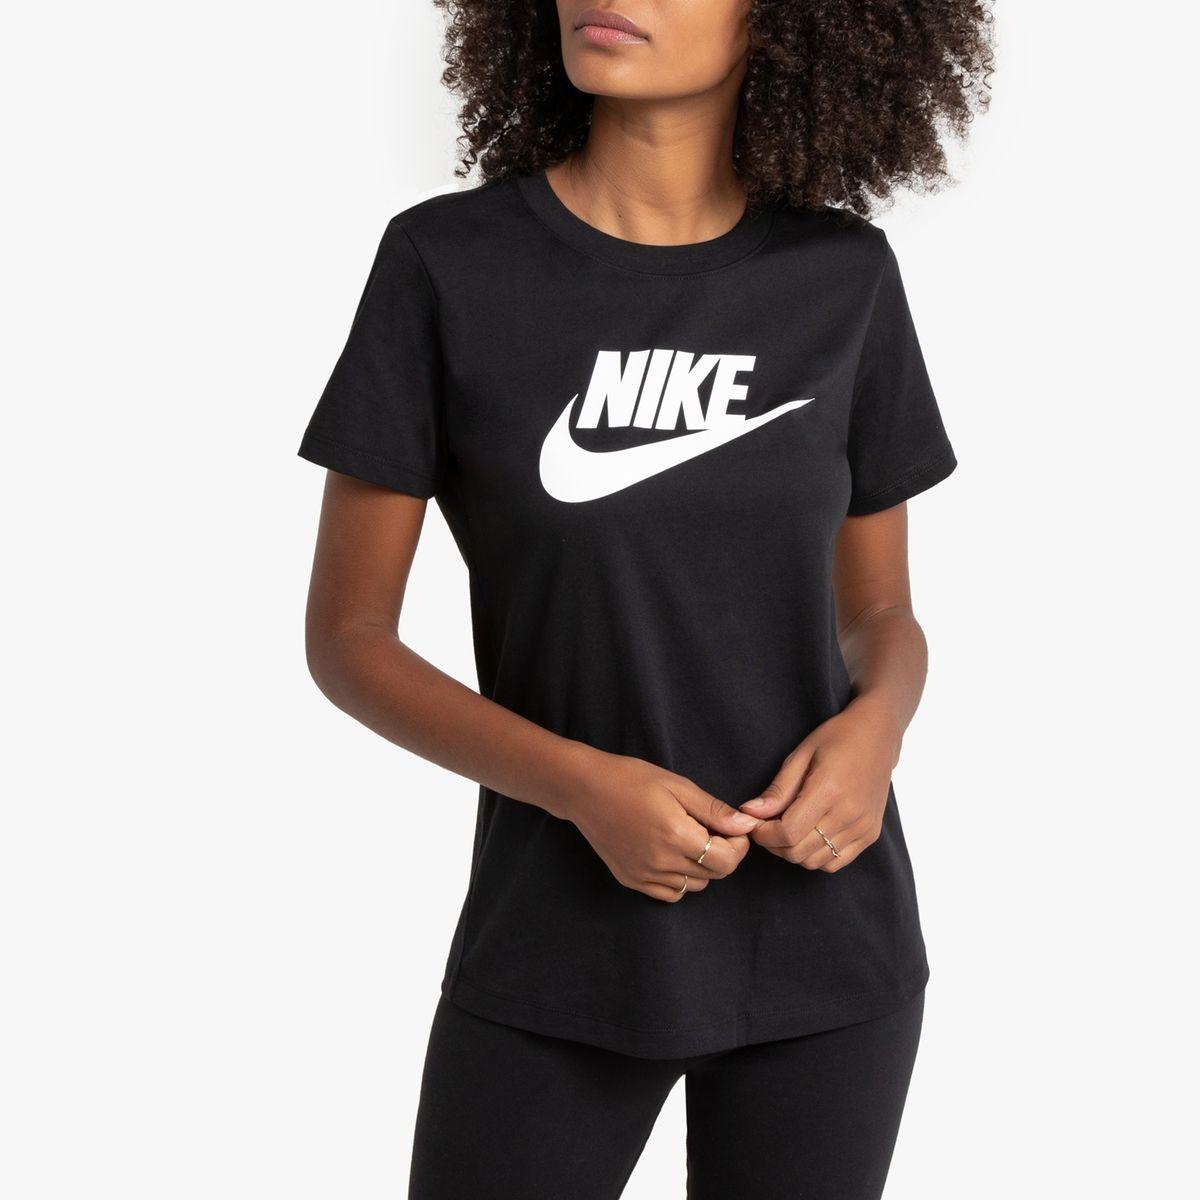 T-shirt Nike Sportswear logo devant